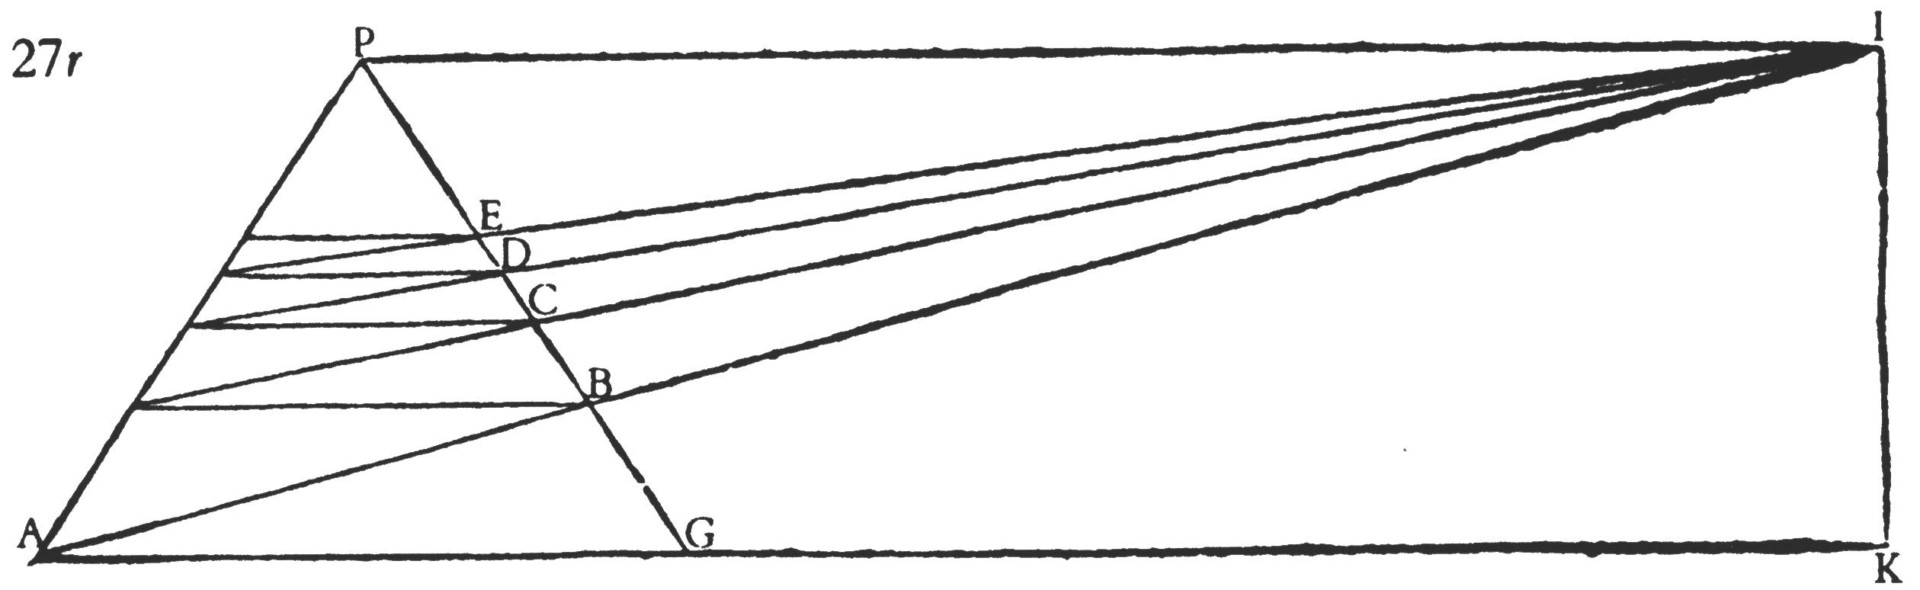 THE BREAKDOWN OF THE PROMENADE: image 13